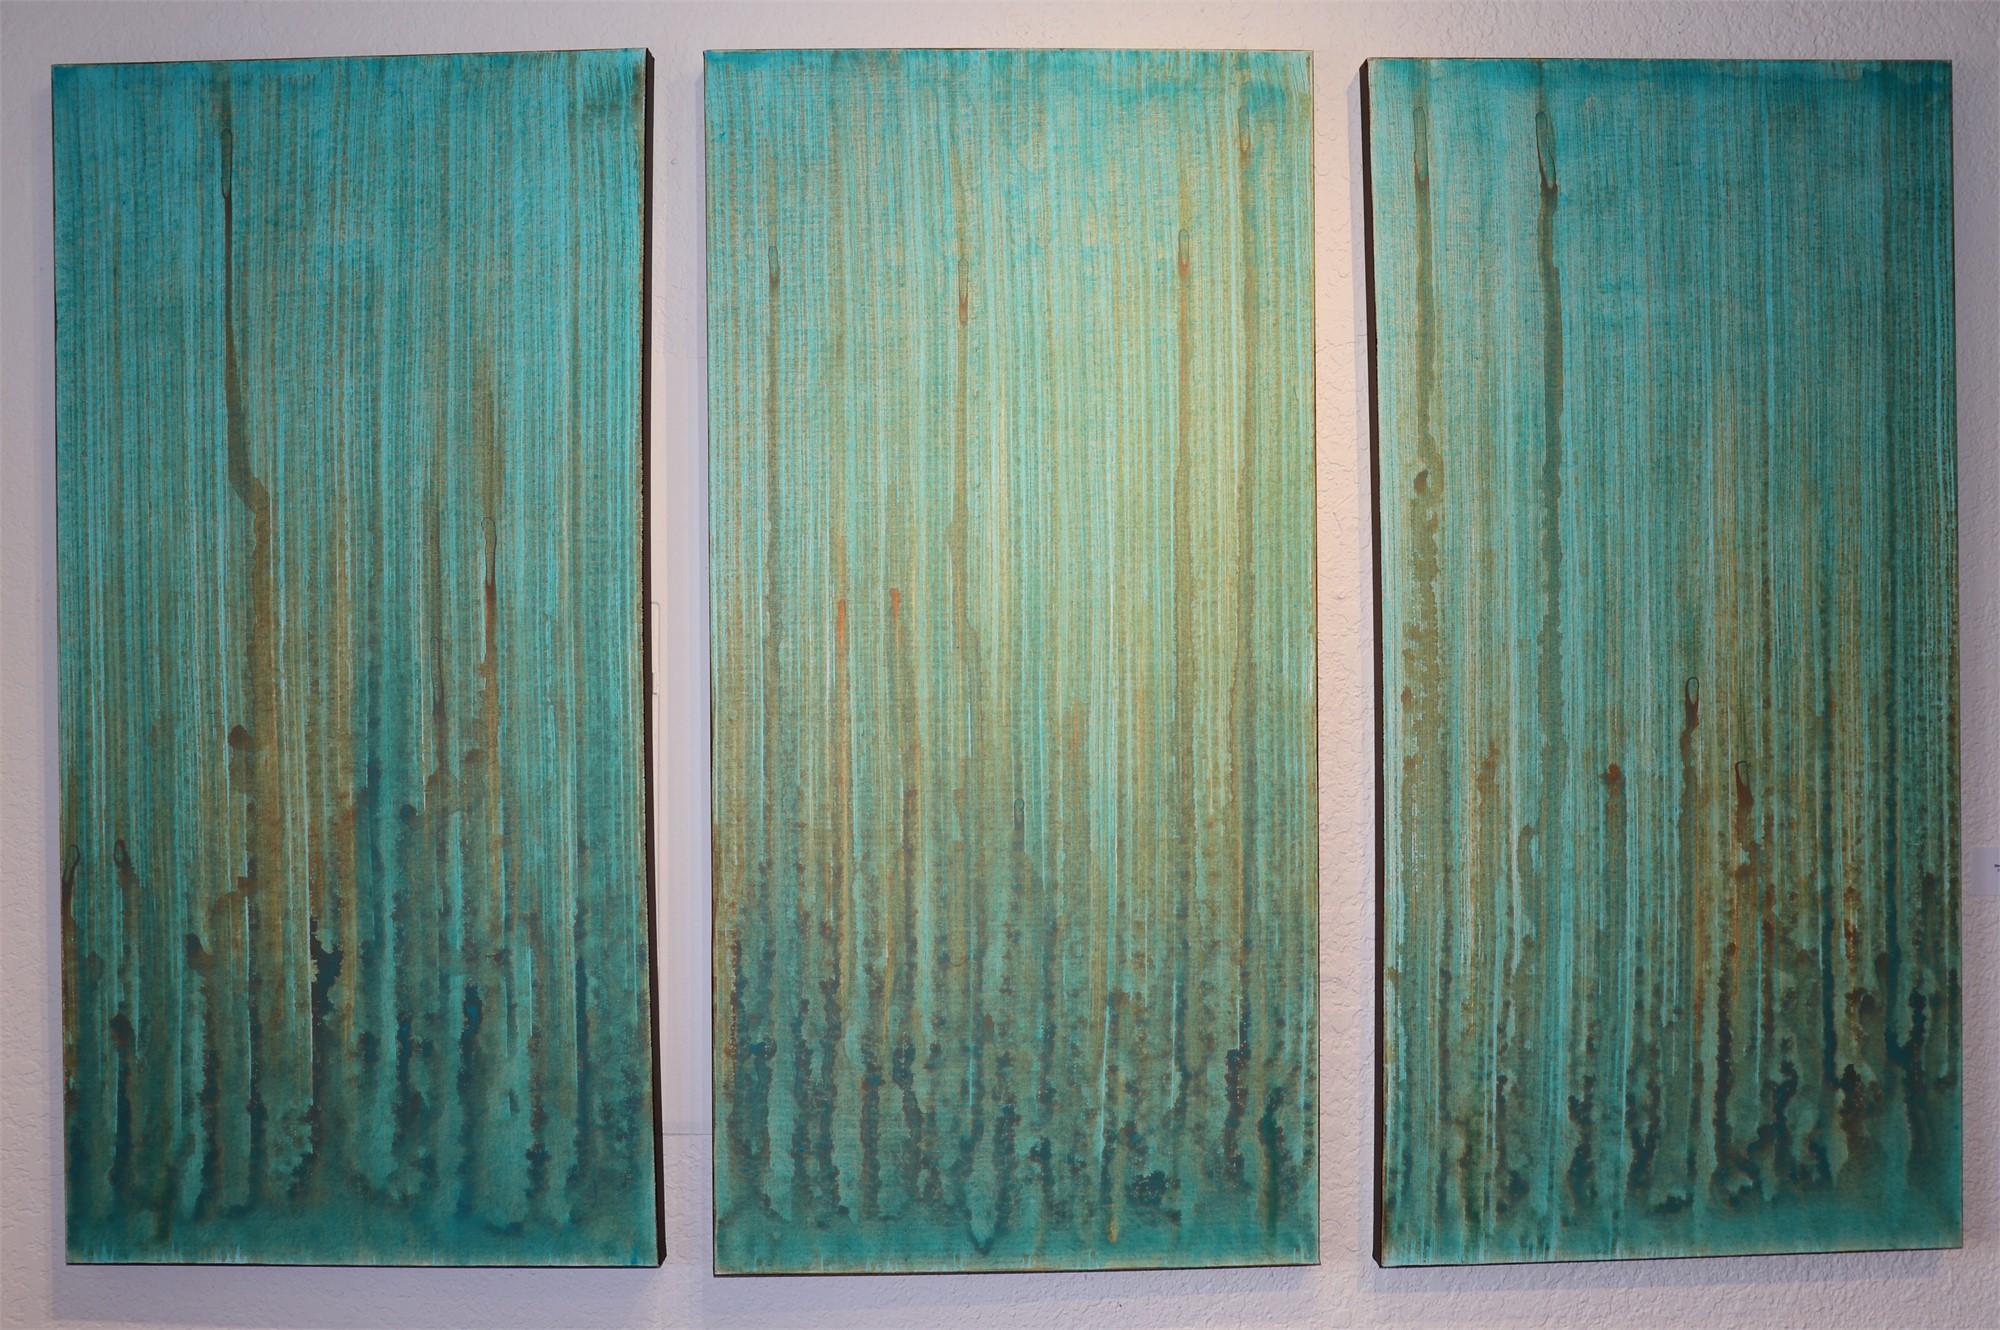 Rising Mist Triptych by Steven Anton Rehage